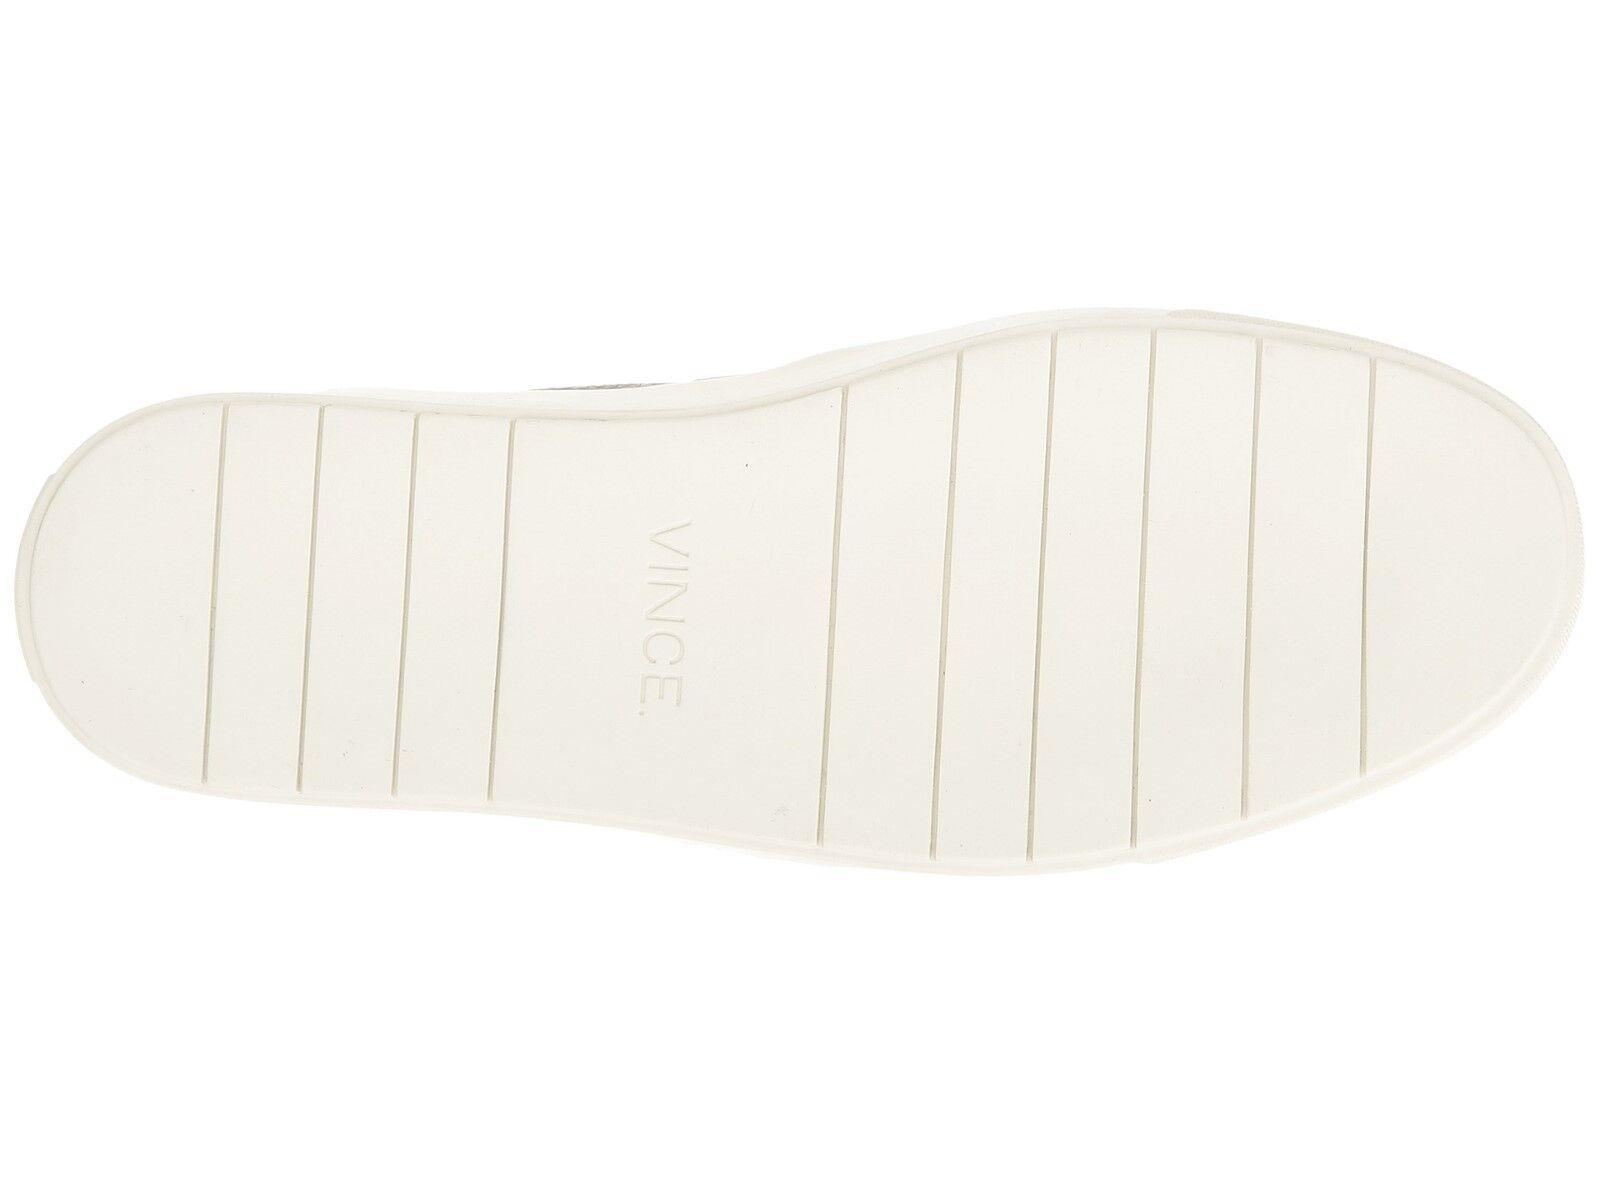 NIB Vince Blair 12 Leder Slip On Sneaker, Metallic Metallic Metallic Bronze, sz 7M (37-EUR) 8c0136